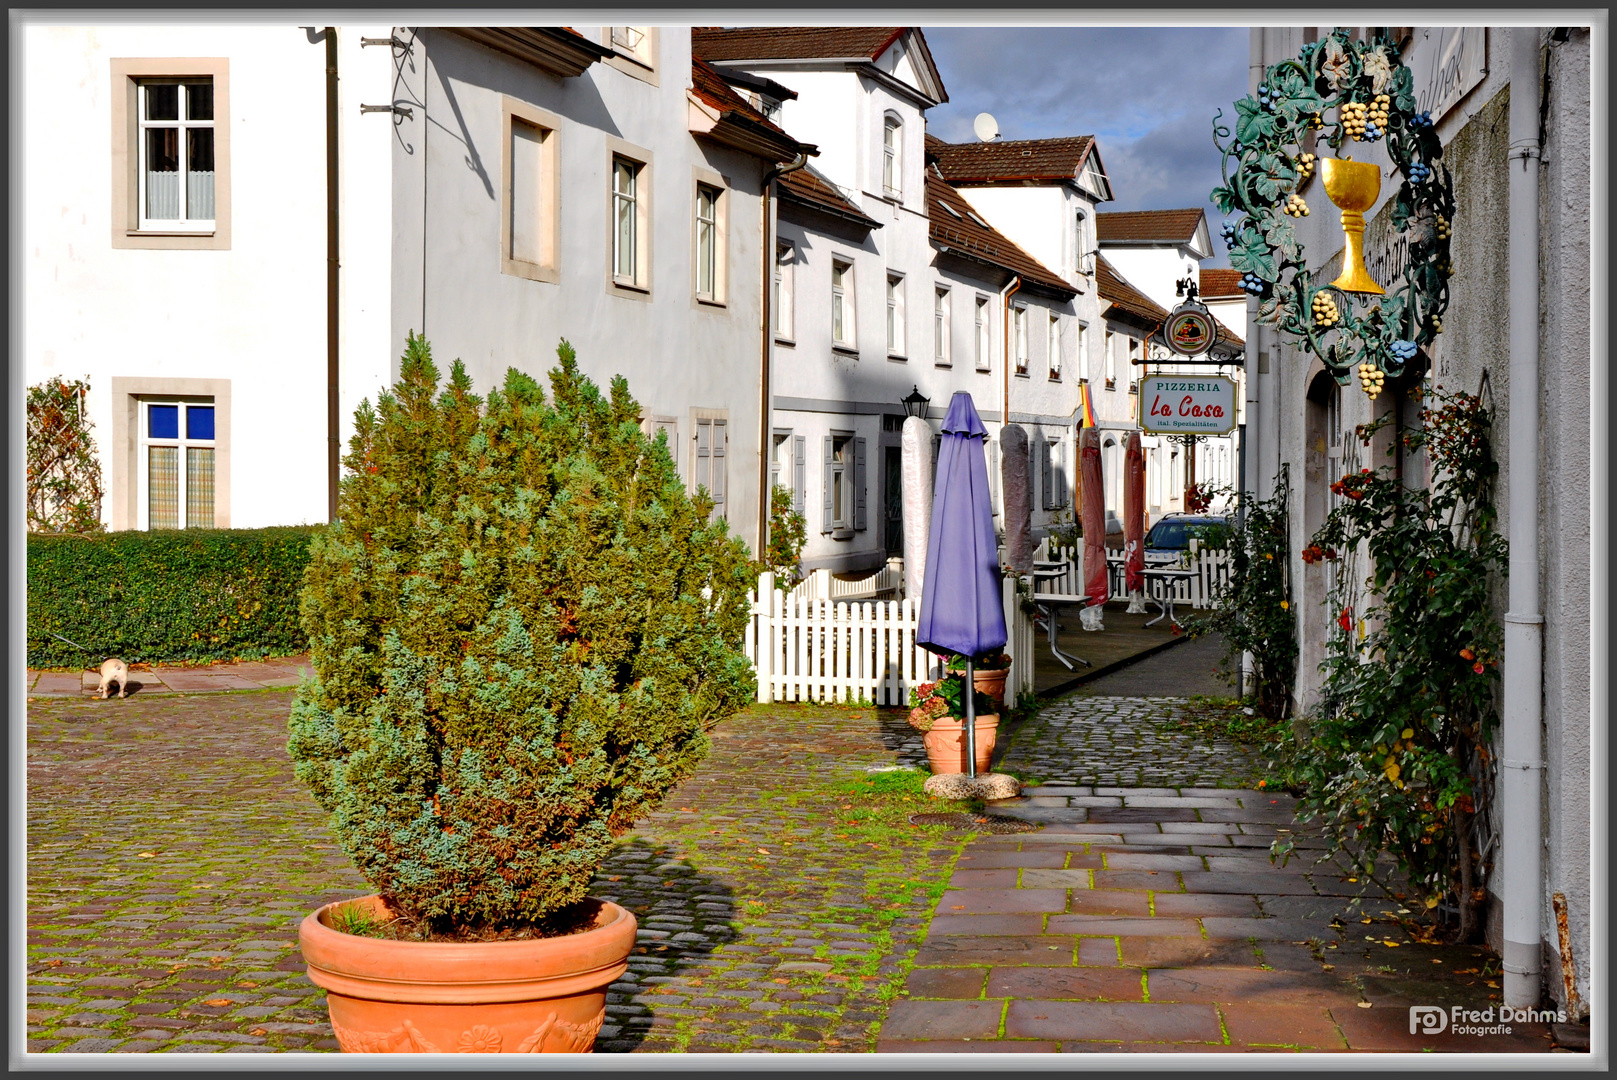 Spaziergang in Bad Karlshafen